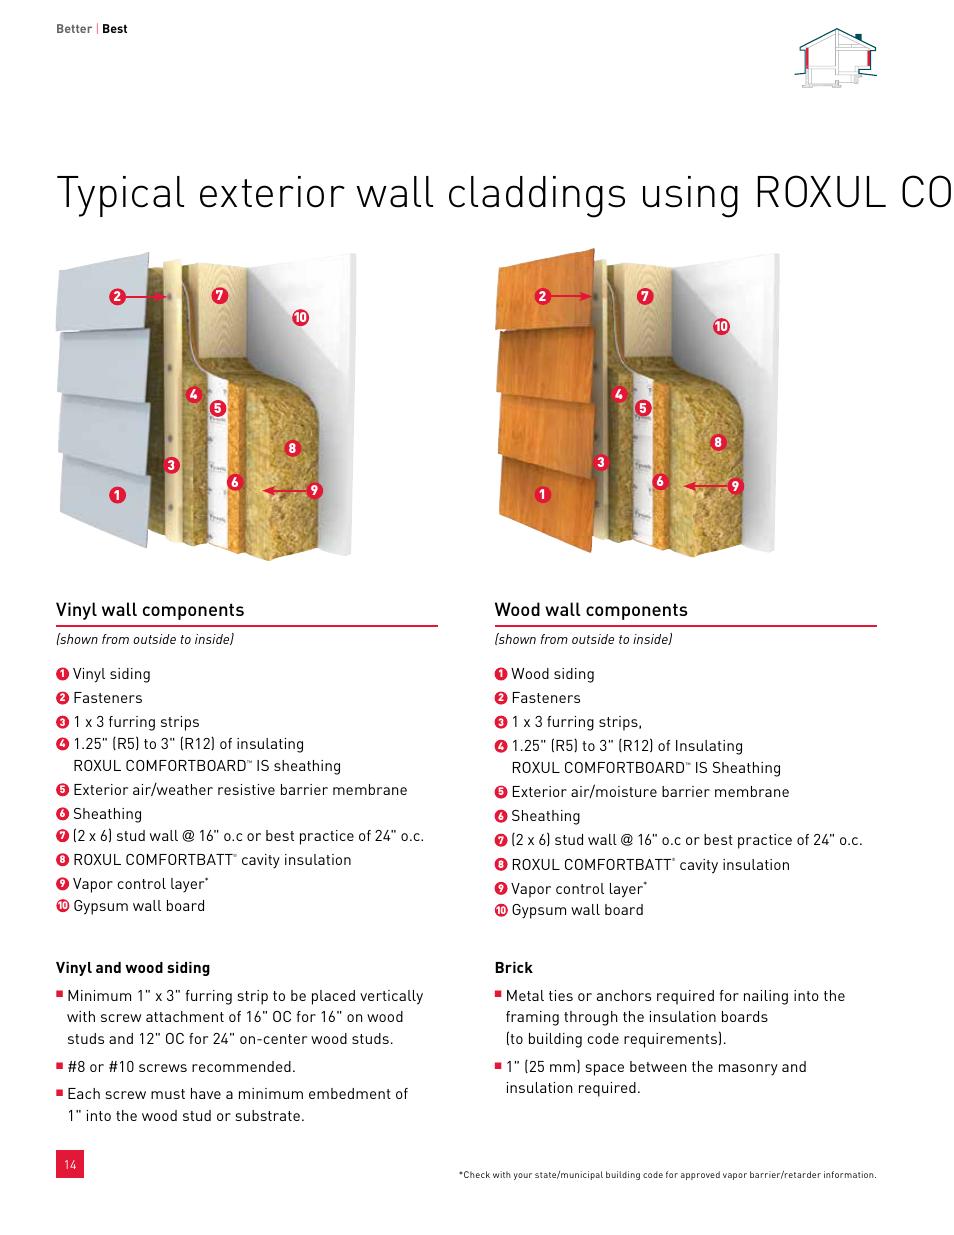 And Roxul Comfortboard Vinyl Wall Components Wood Wall